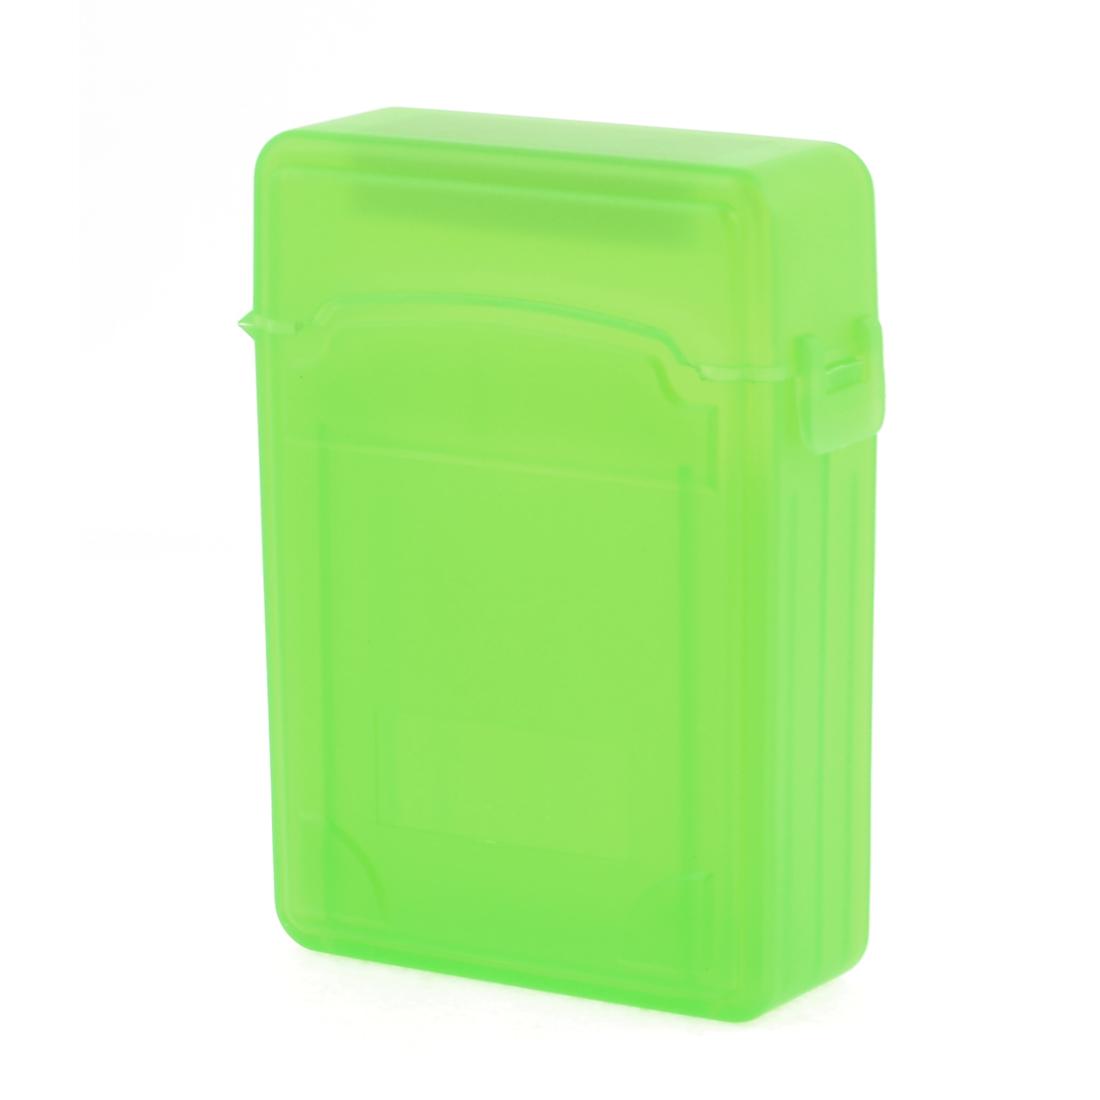 "Double Layer Antislip 2.5"" SATA HDD Storage Hard Drive Case Box Green"